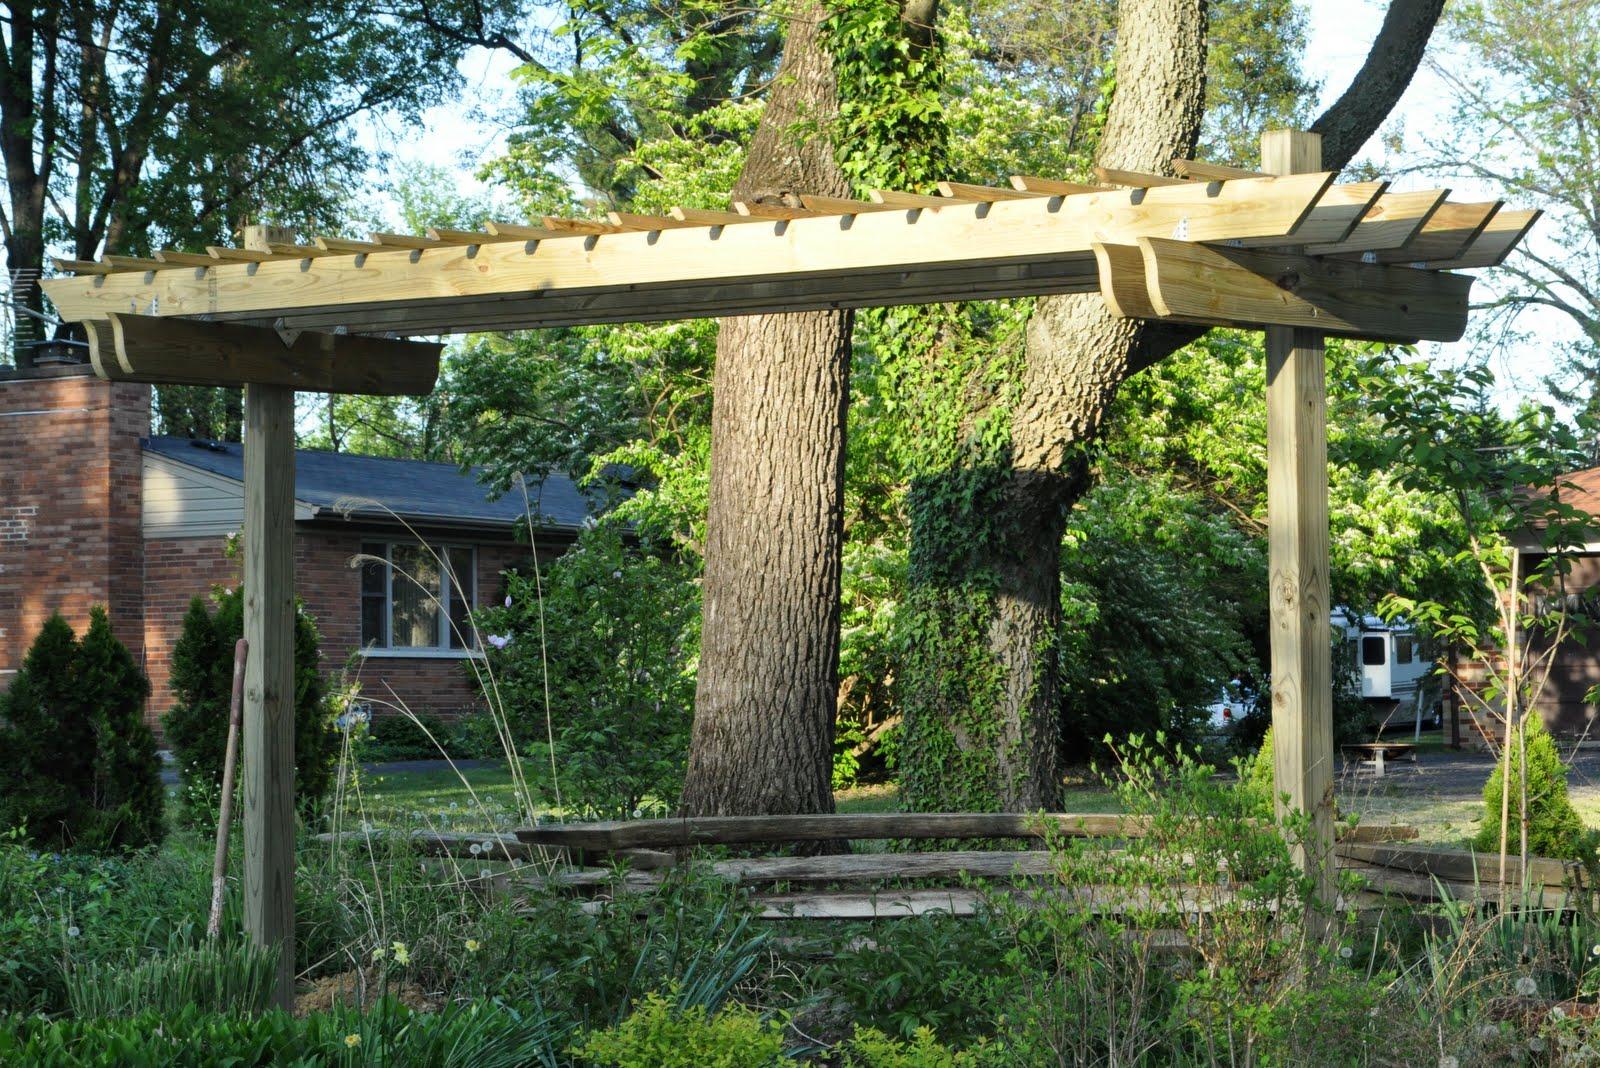 Backyard Hammock Ideas : Backyard Hammock Ideas  Small Backyard Landscaping Ideas